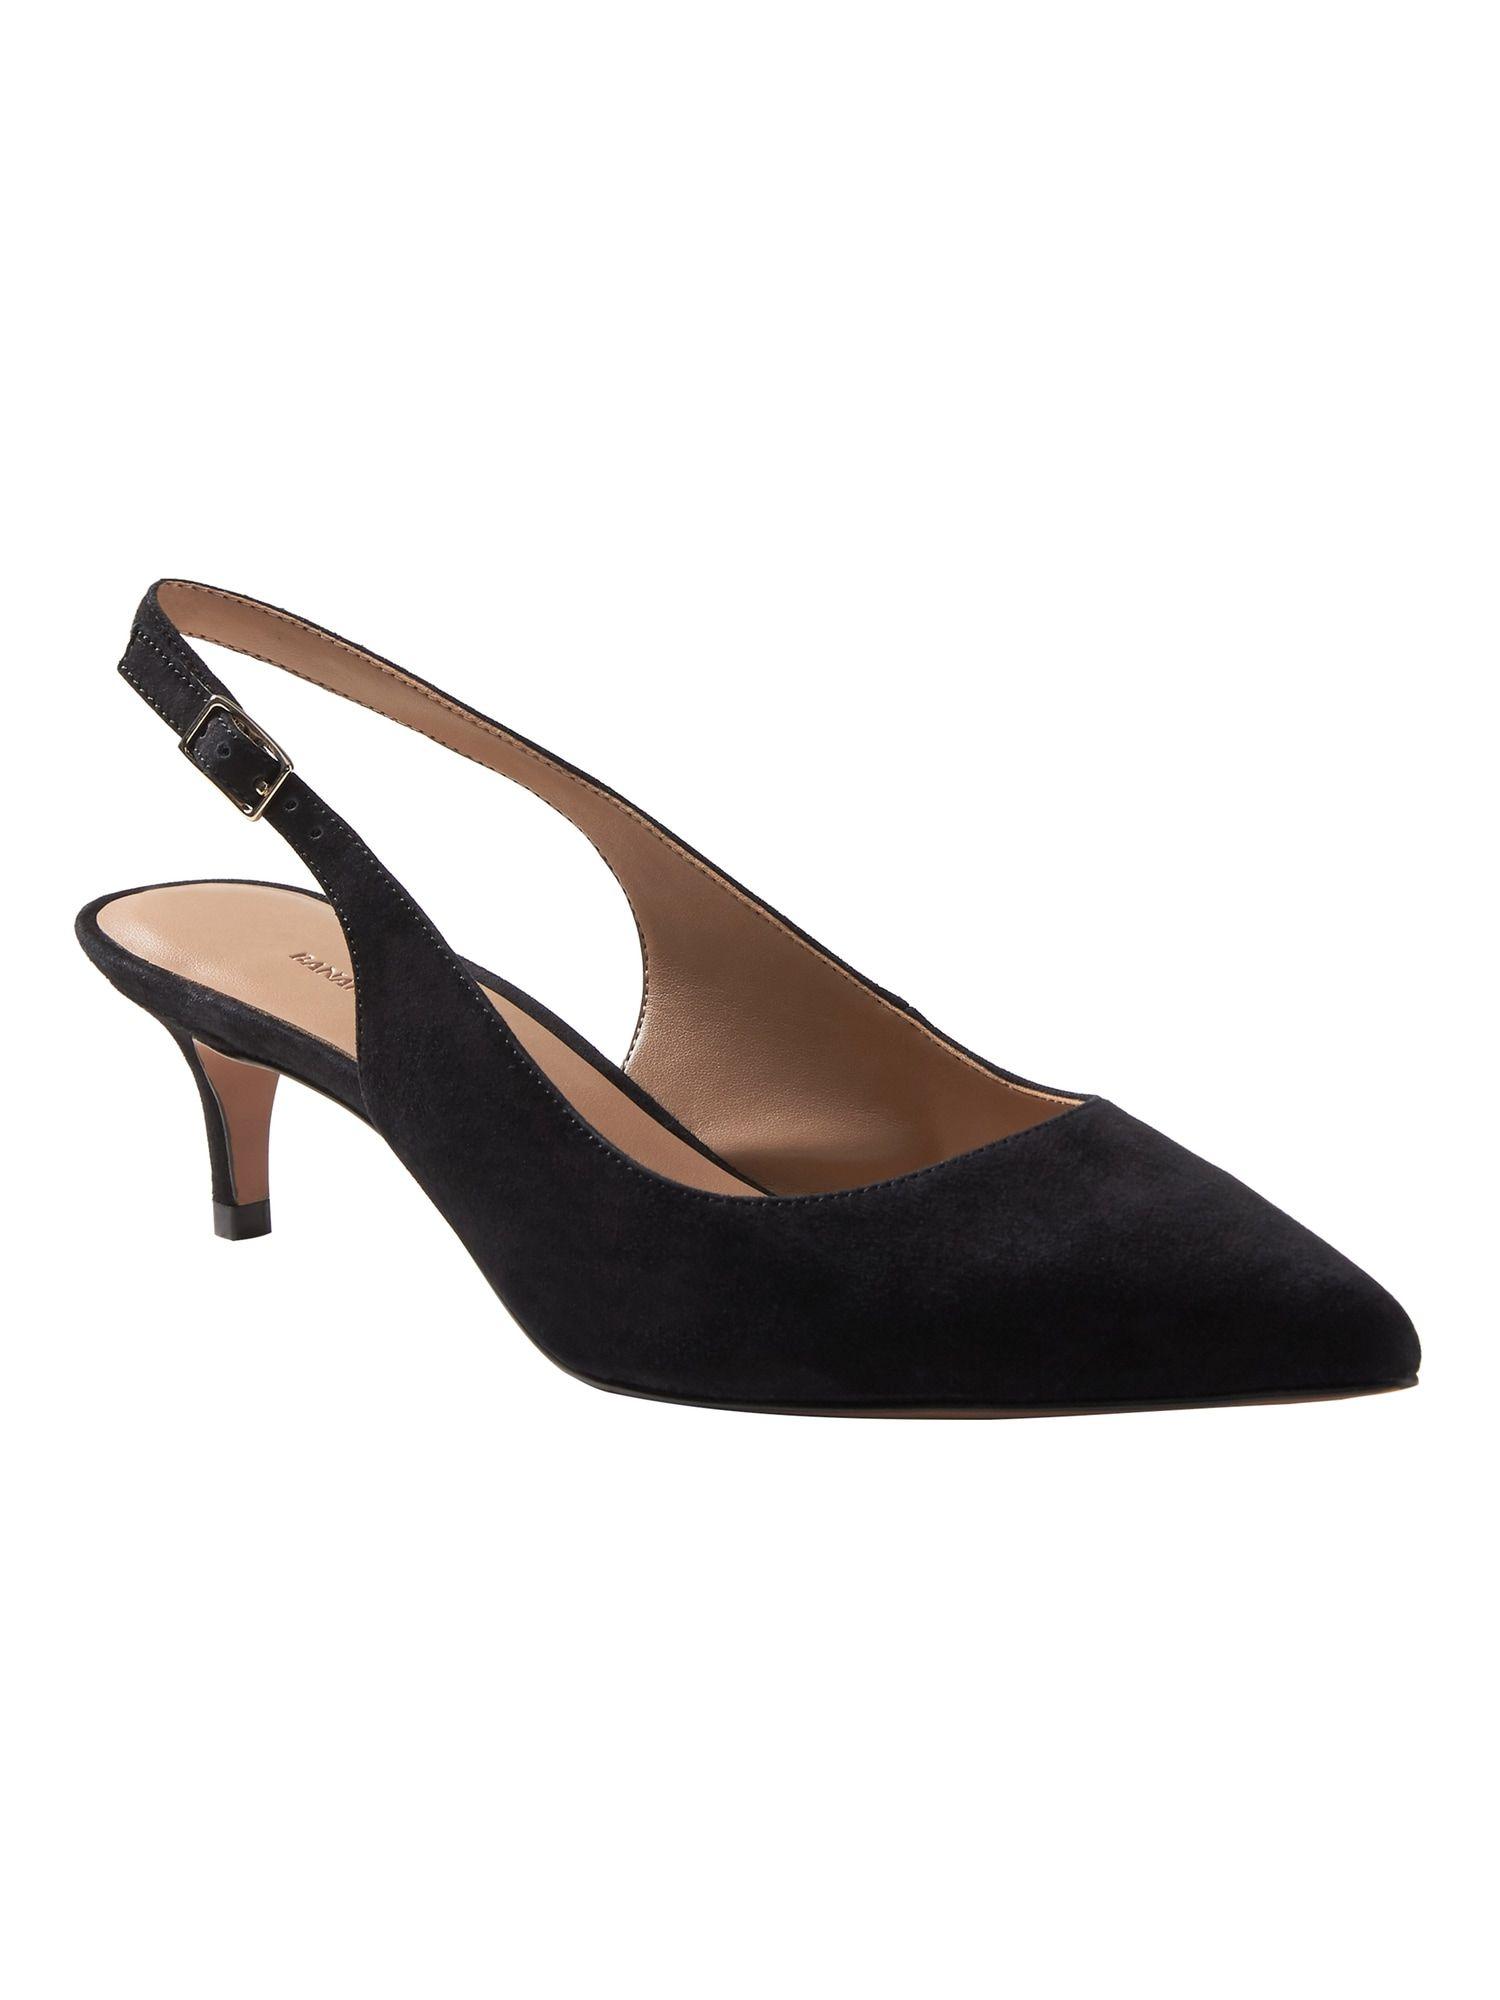 Product Black Kitten Heels Heels Fashionista Shoes